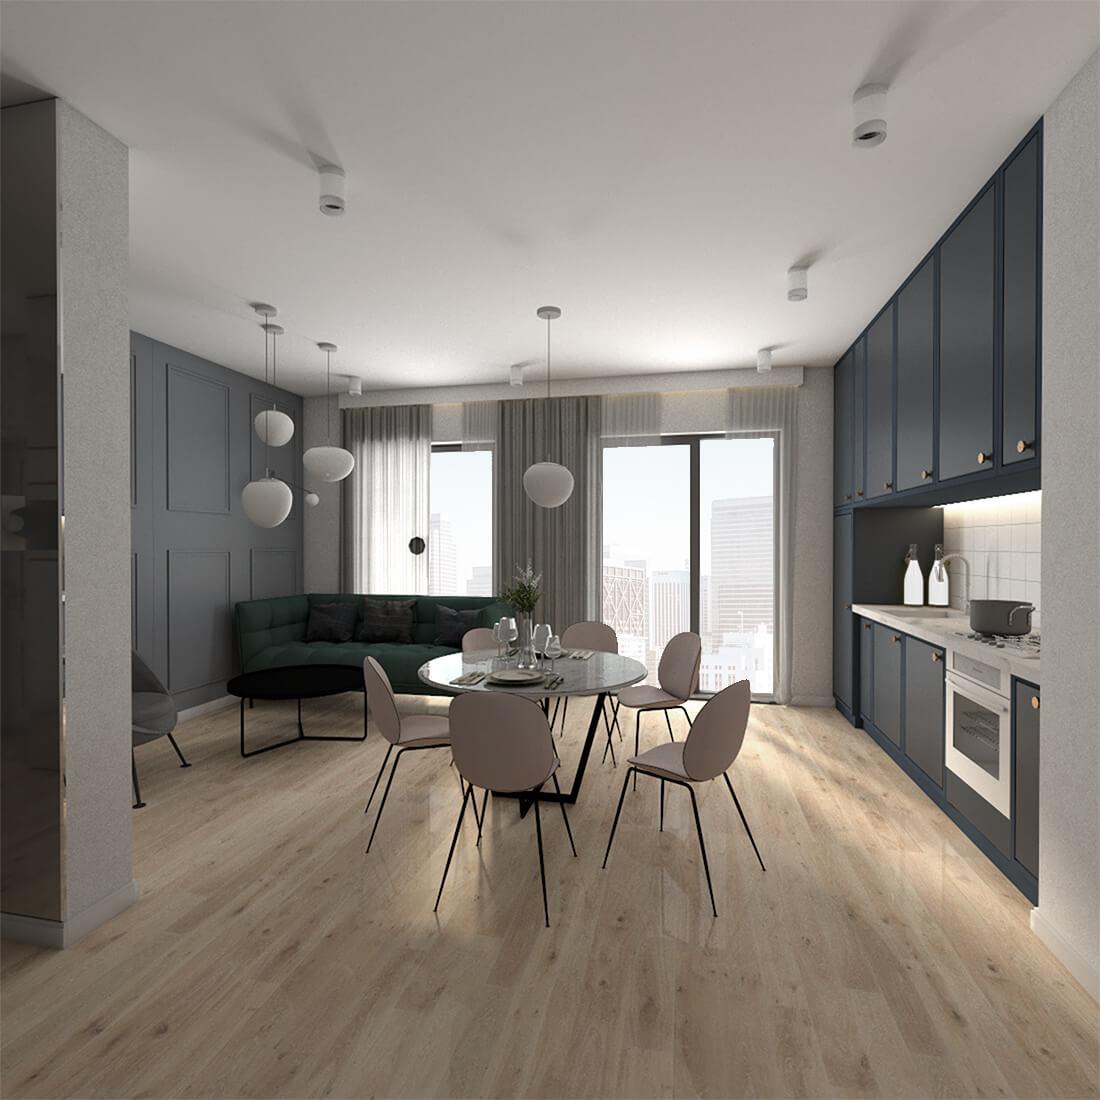 kuchnia z jadalnią i salonem w mieszkaniu 60m2